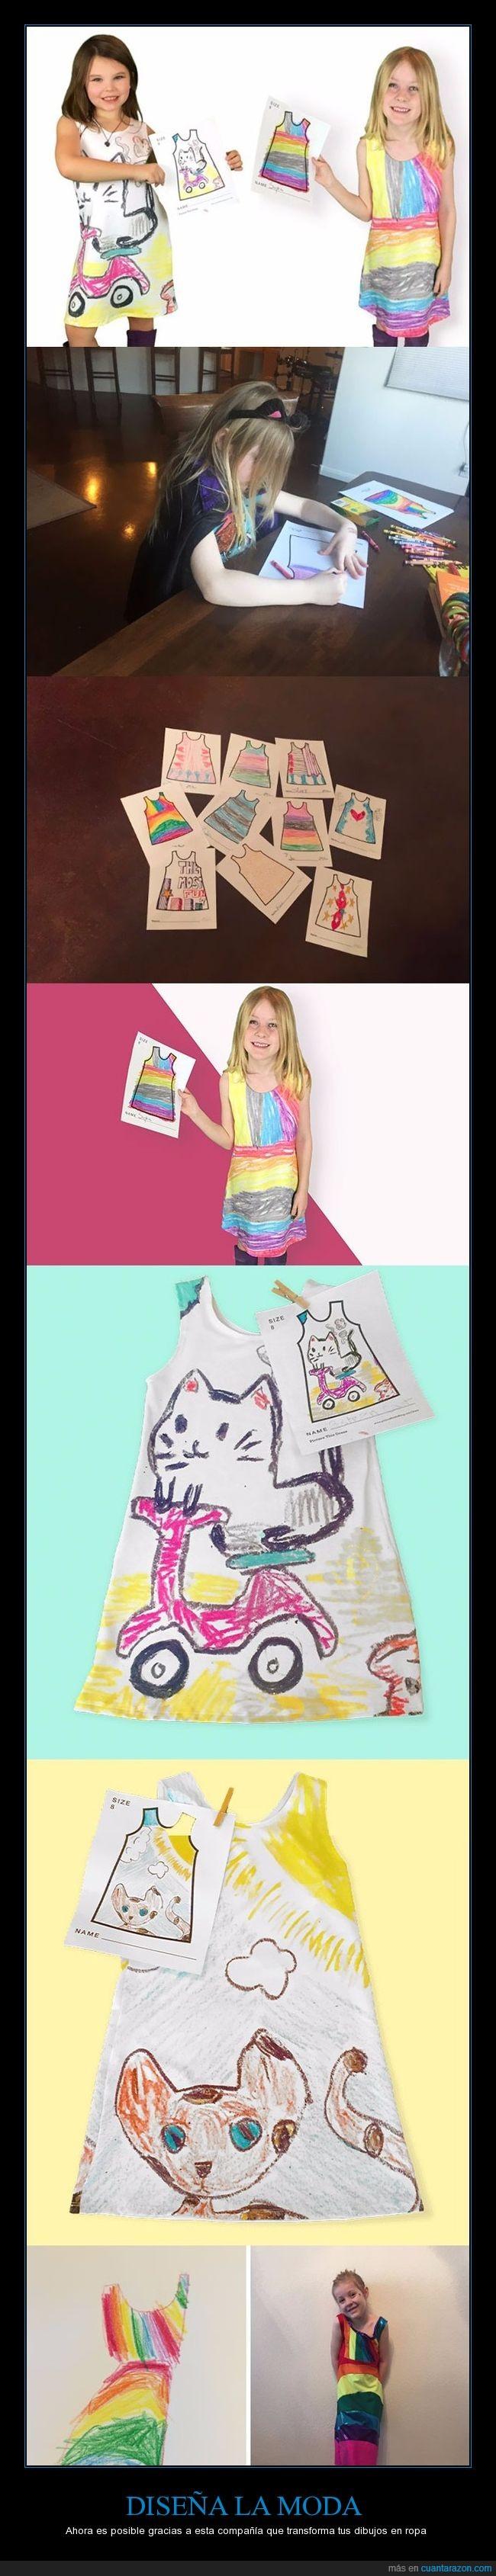 dibujar,dibujo,niña,ropa,vestido